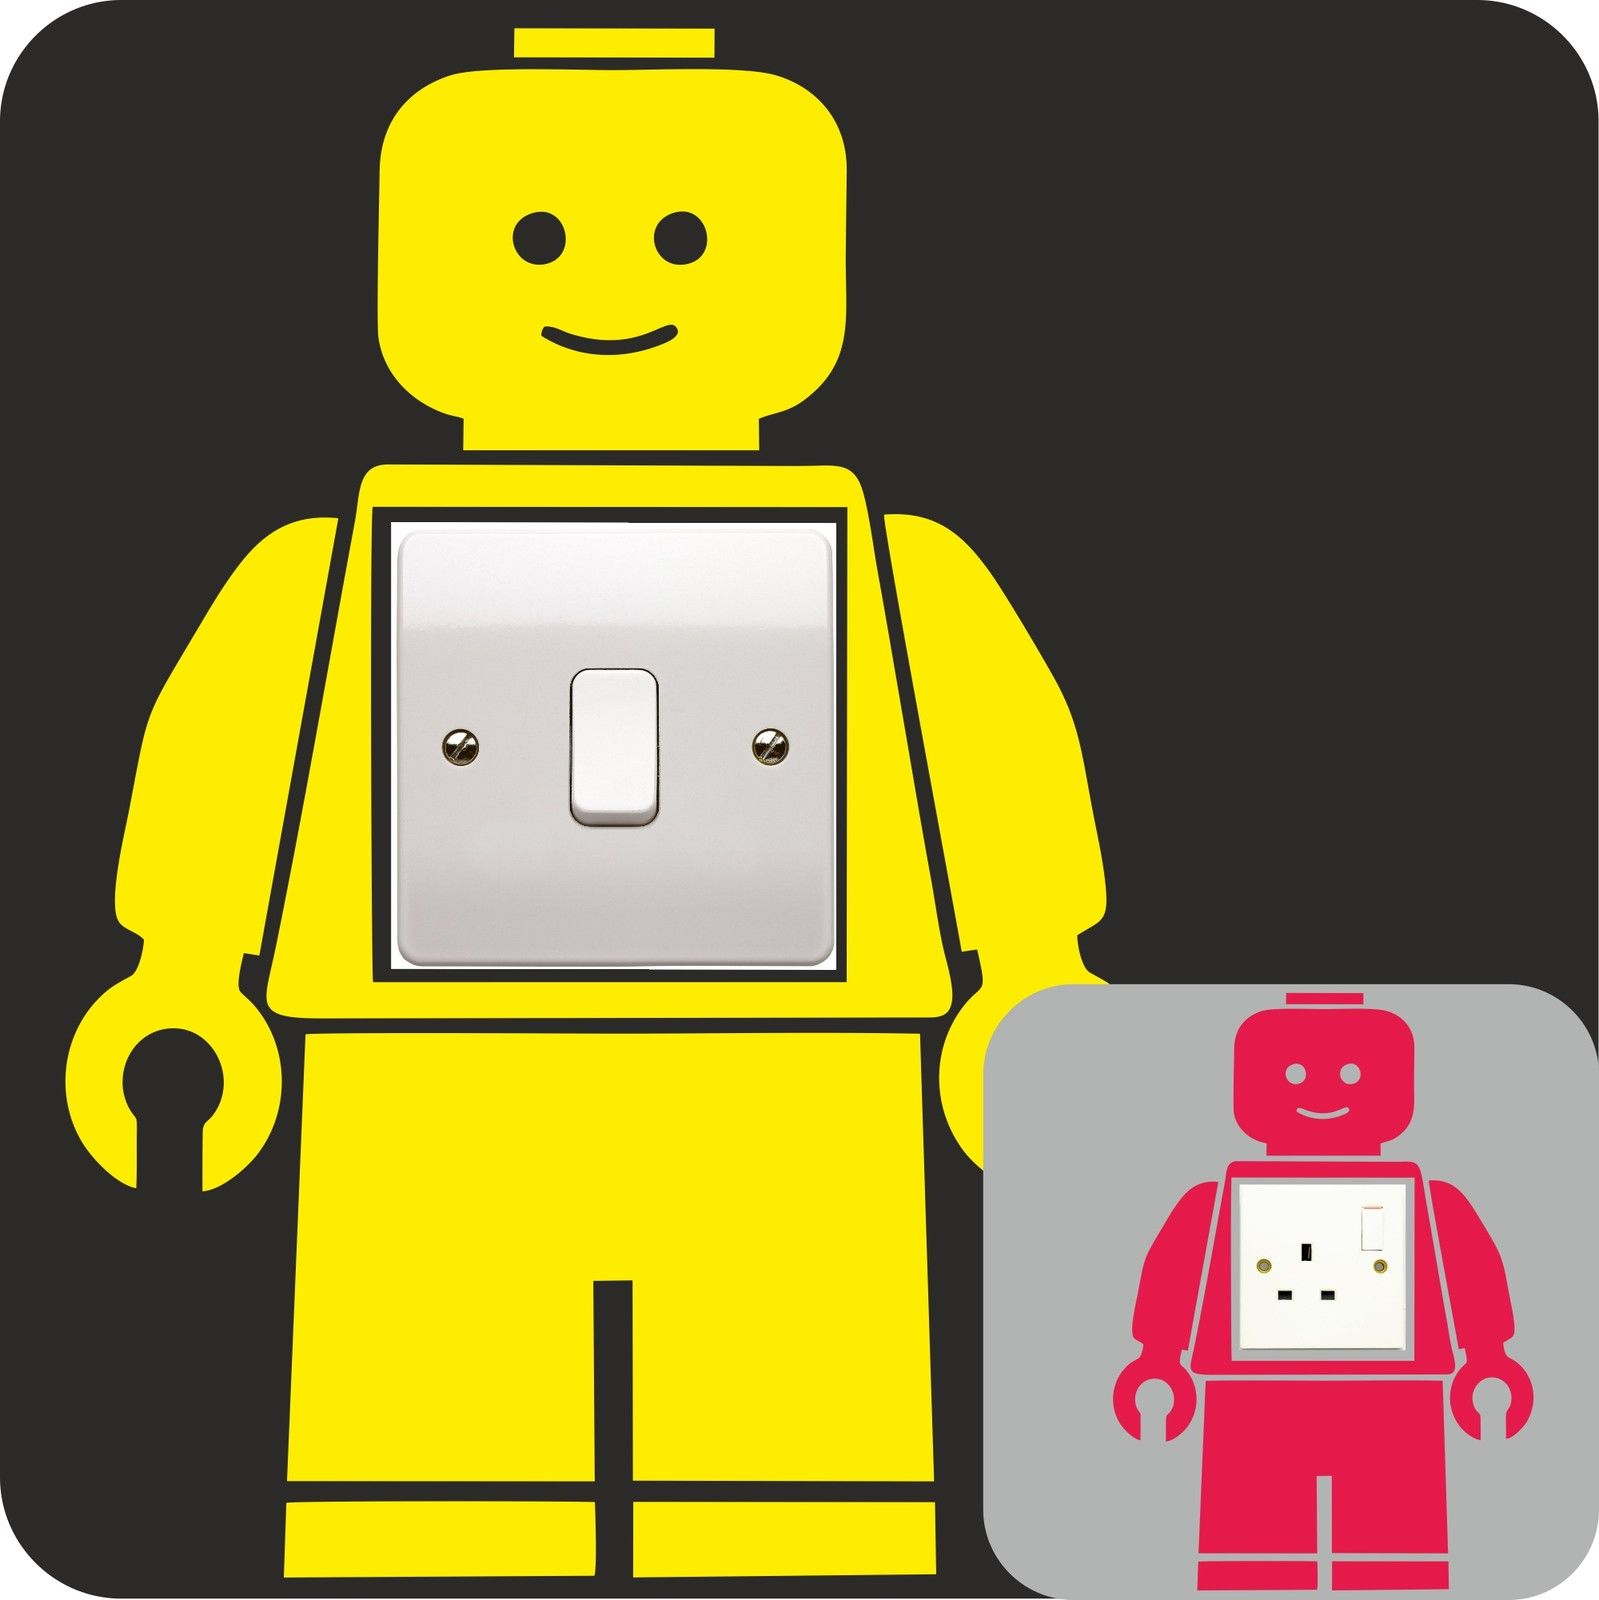 ROBOT KIDS sticker LIGHT SWITCH PLUG SURROUND bedroom WALL ART QUOTE DECOR 2